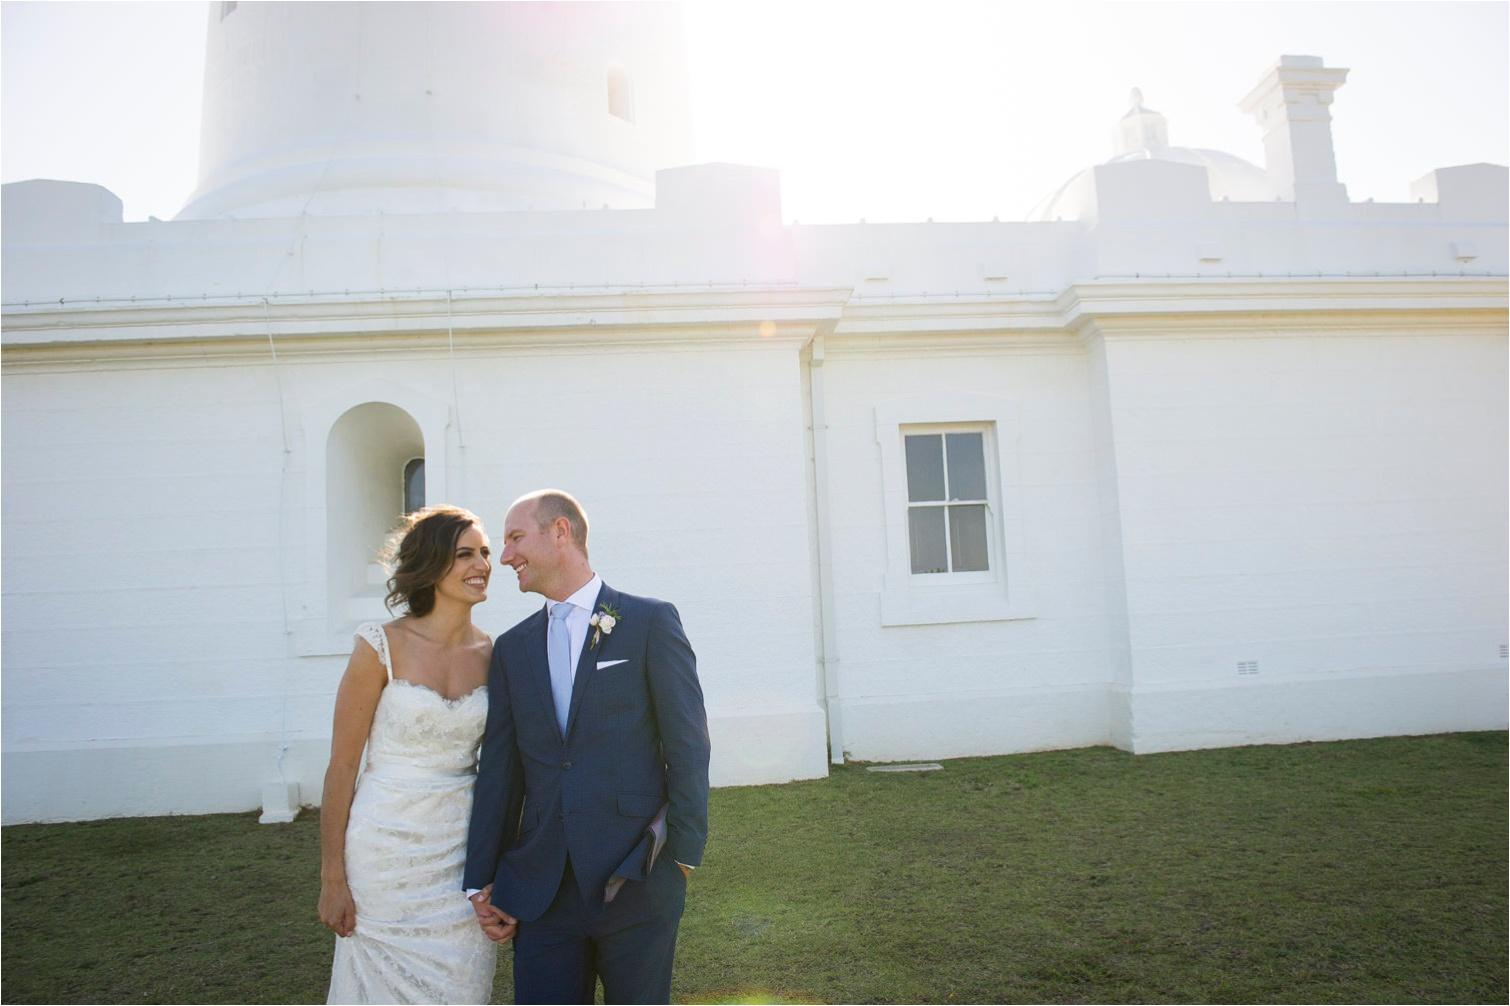 Nicole&Carlie_Watsons_Bay_Hotel_Wedding_by_Gold_Coast_Photographers-The_Follans34.jpg